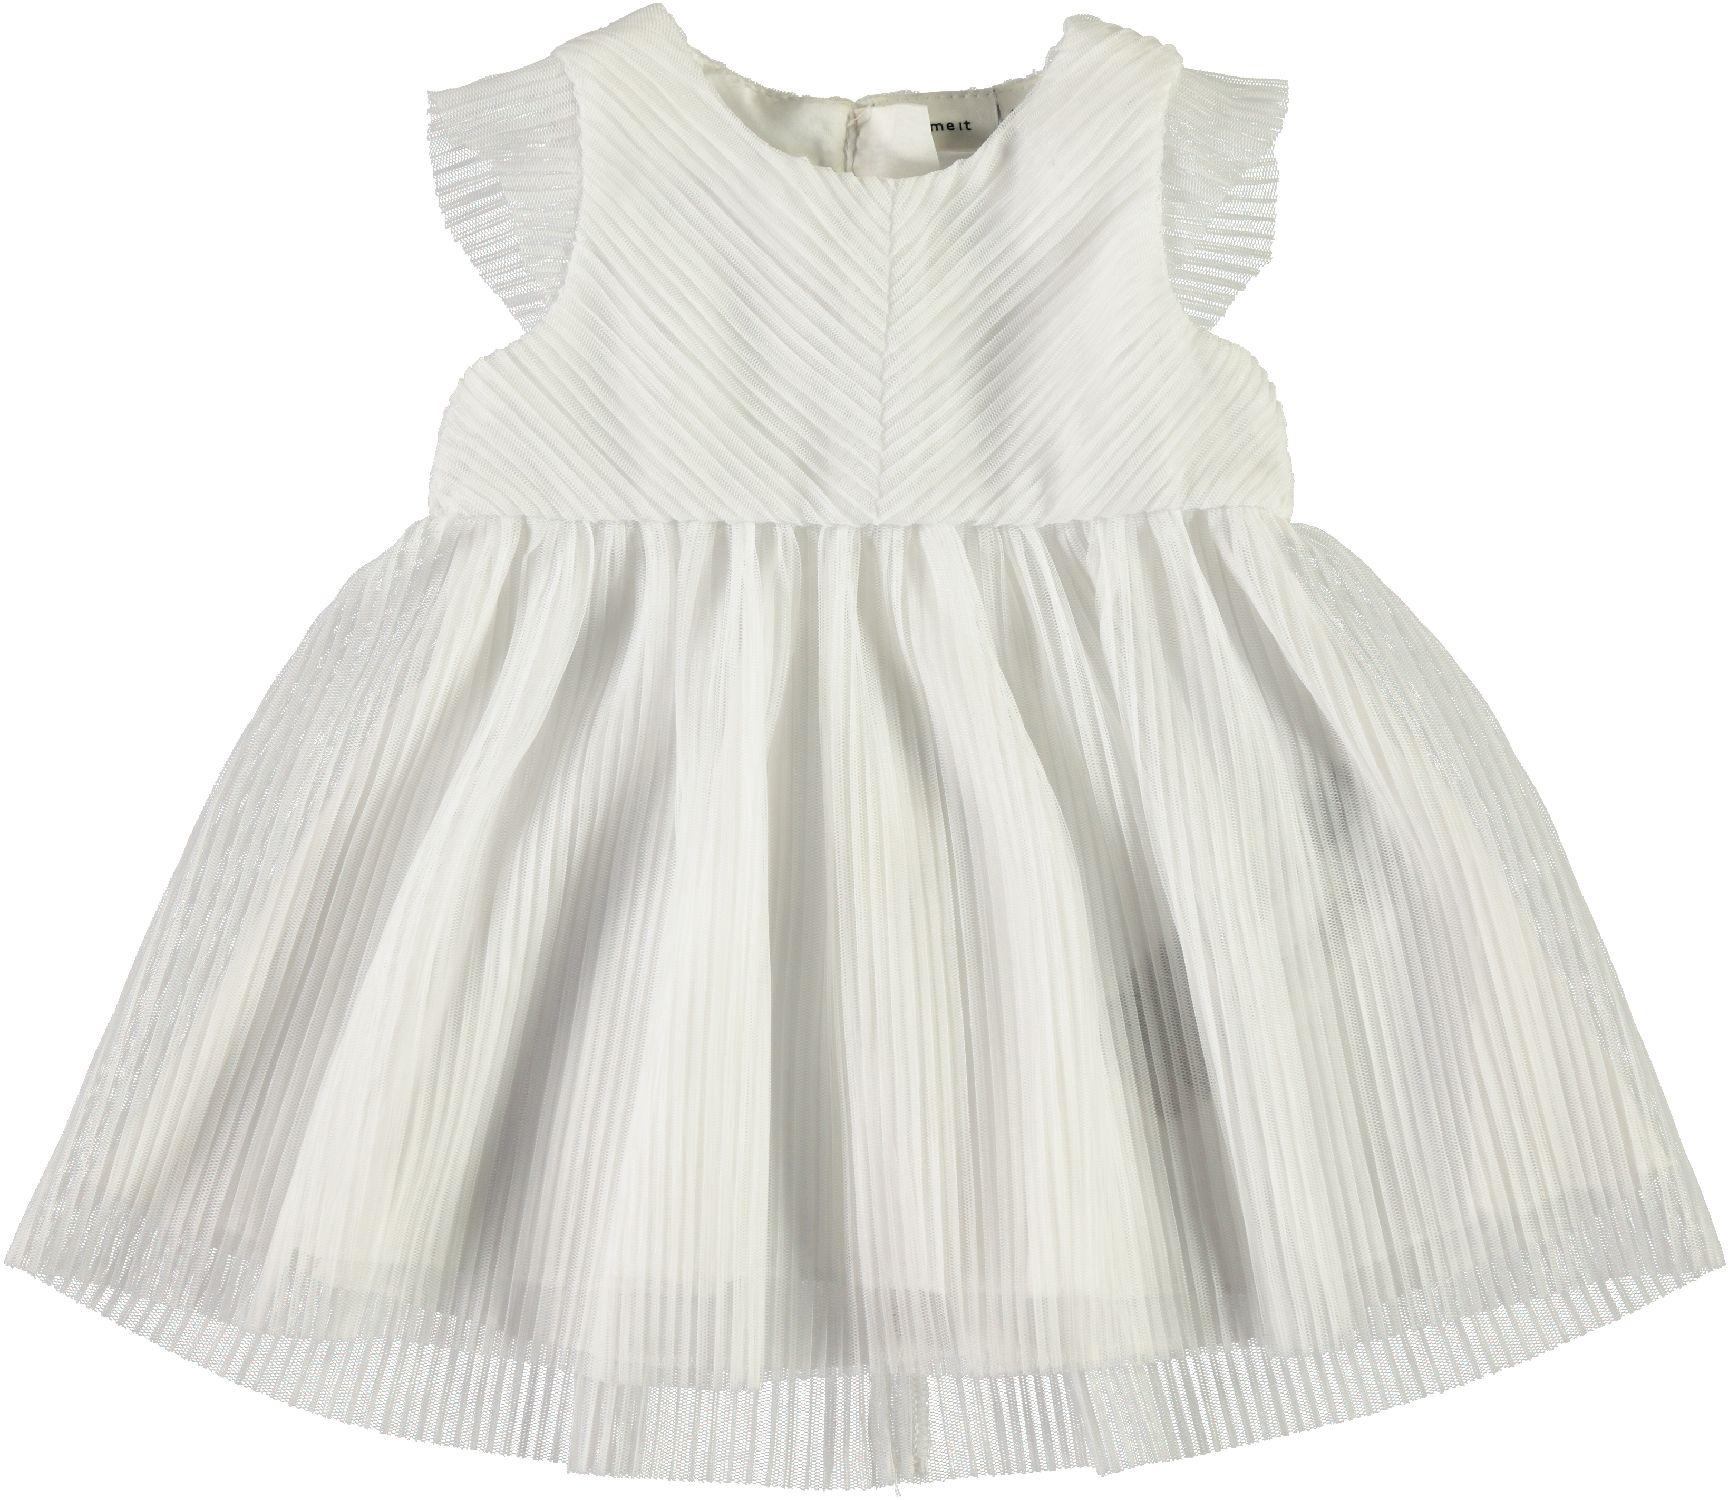 Name It Baby Mädchen Festkleid NBFGARIT Taufkleid ärmellos weiß Festkleidung